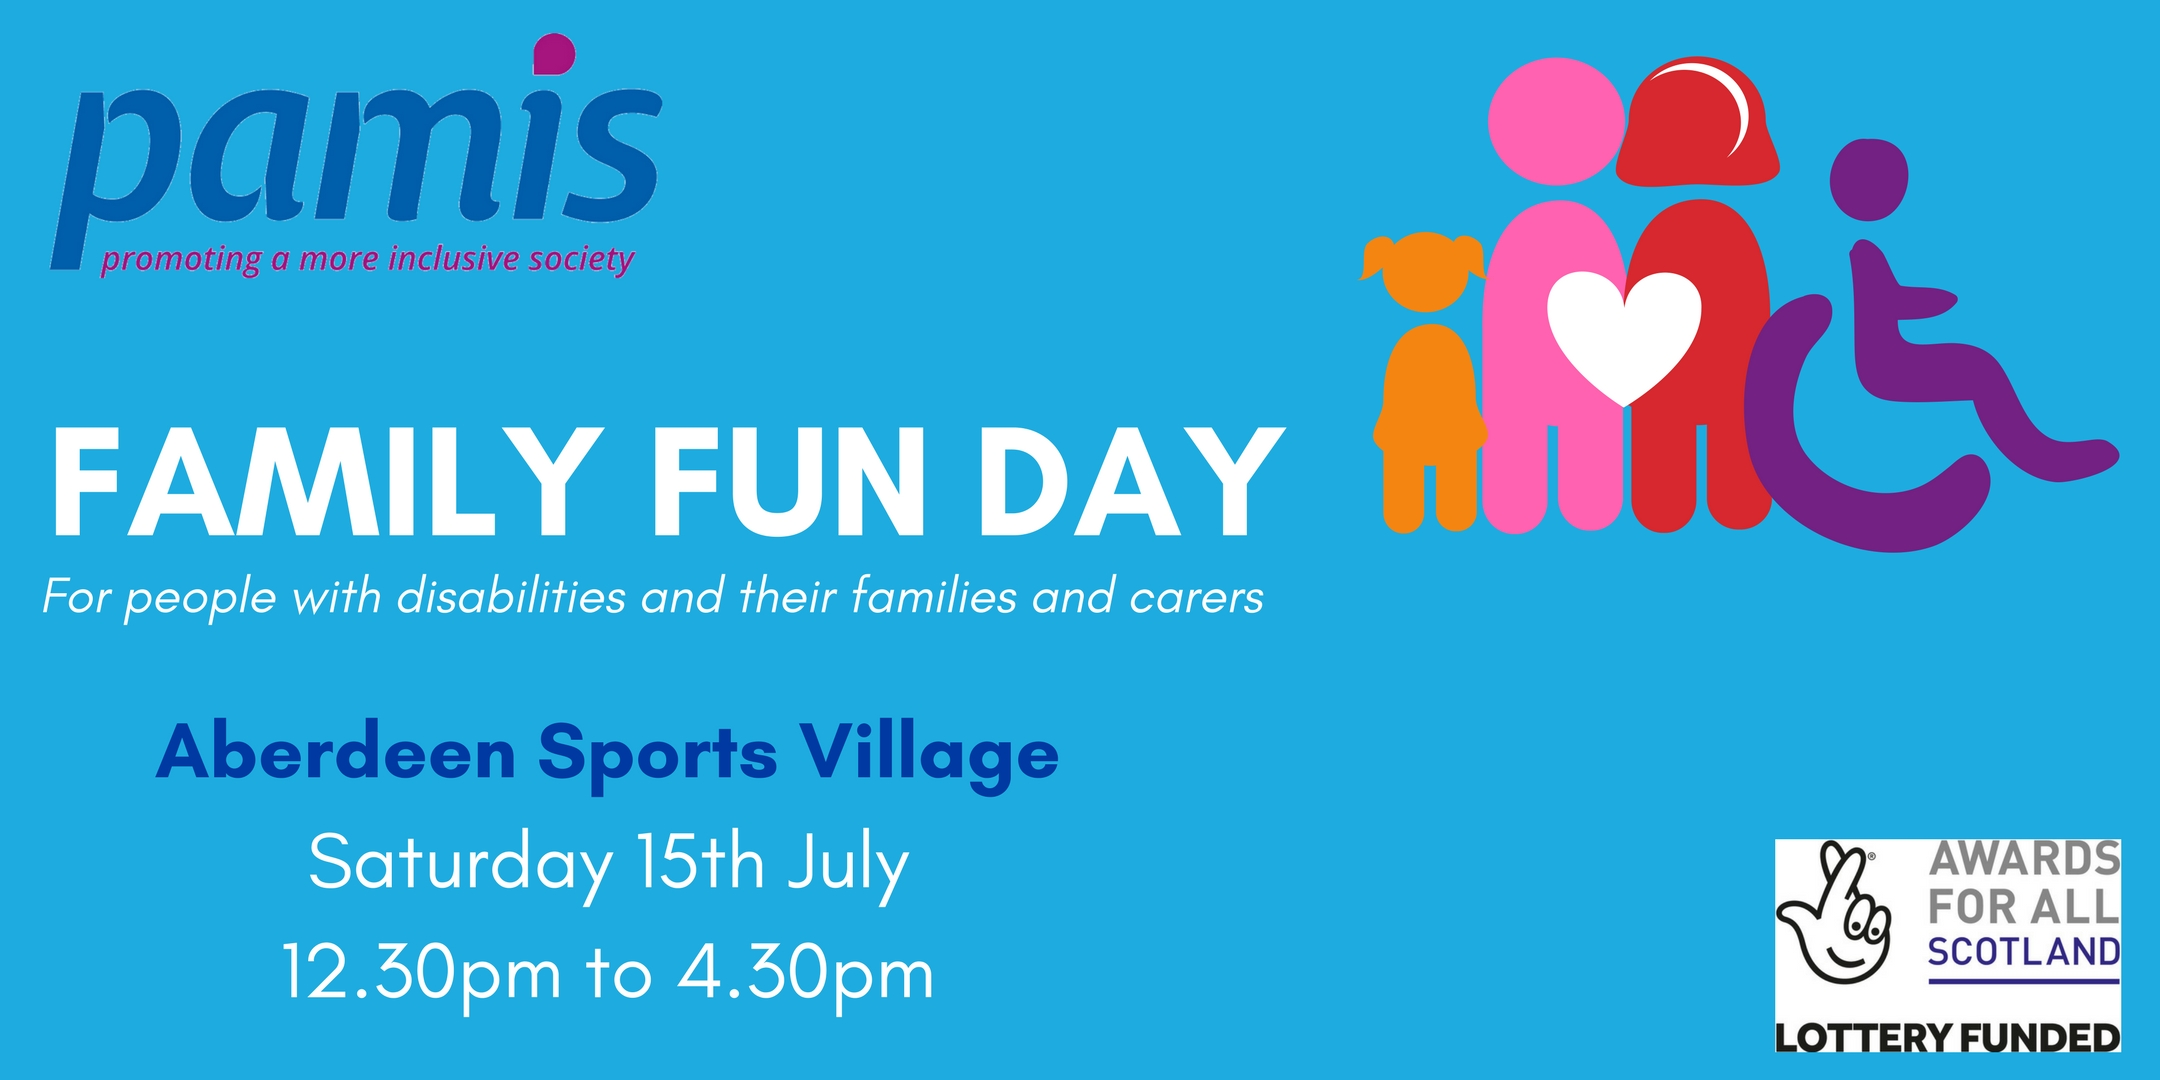 PAMIS Family Fun Day – Grampian